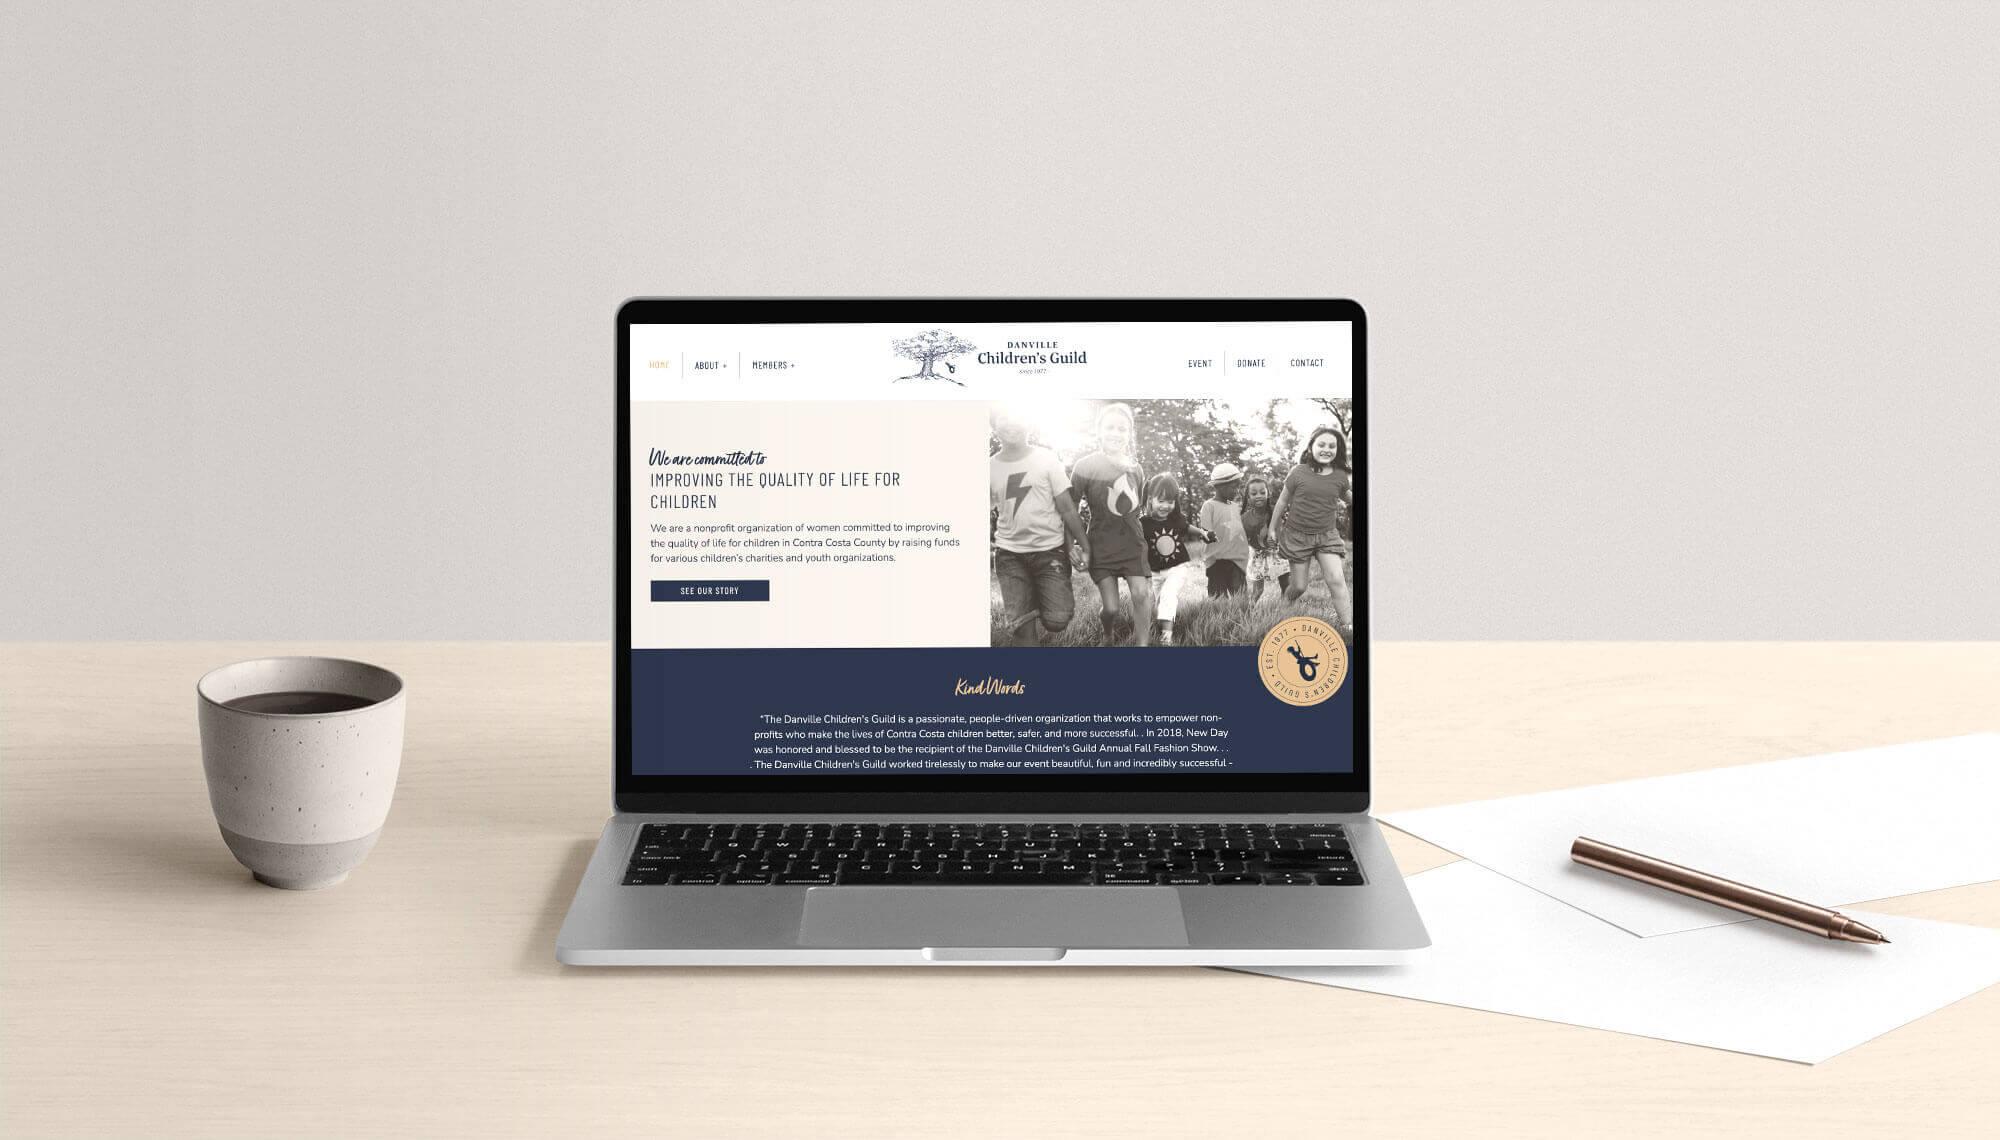 Danville Children's Guild Website Design and Development